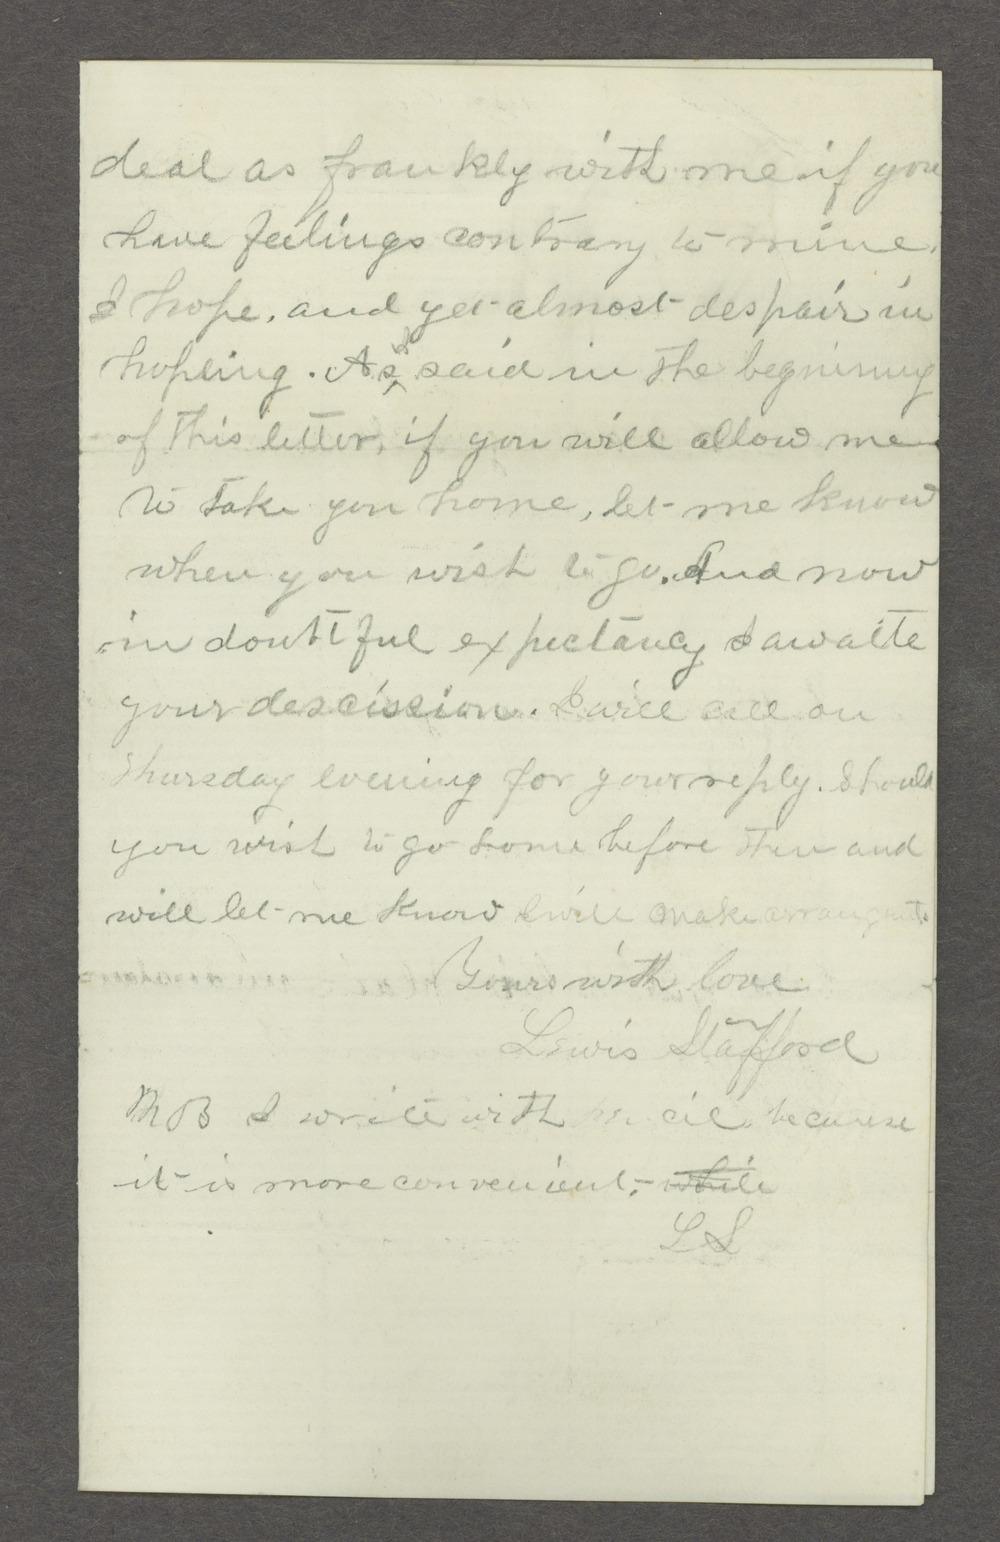 Lewis Stafford to Kate Newland correspondence - 6